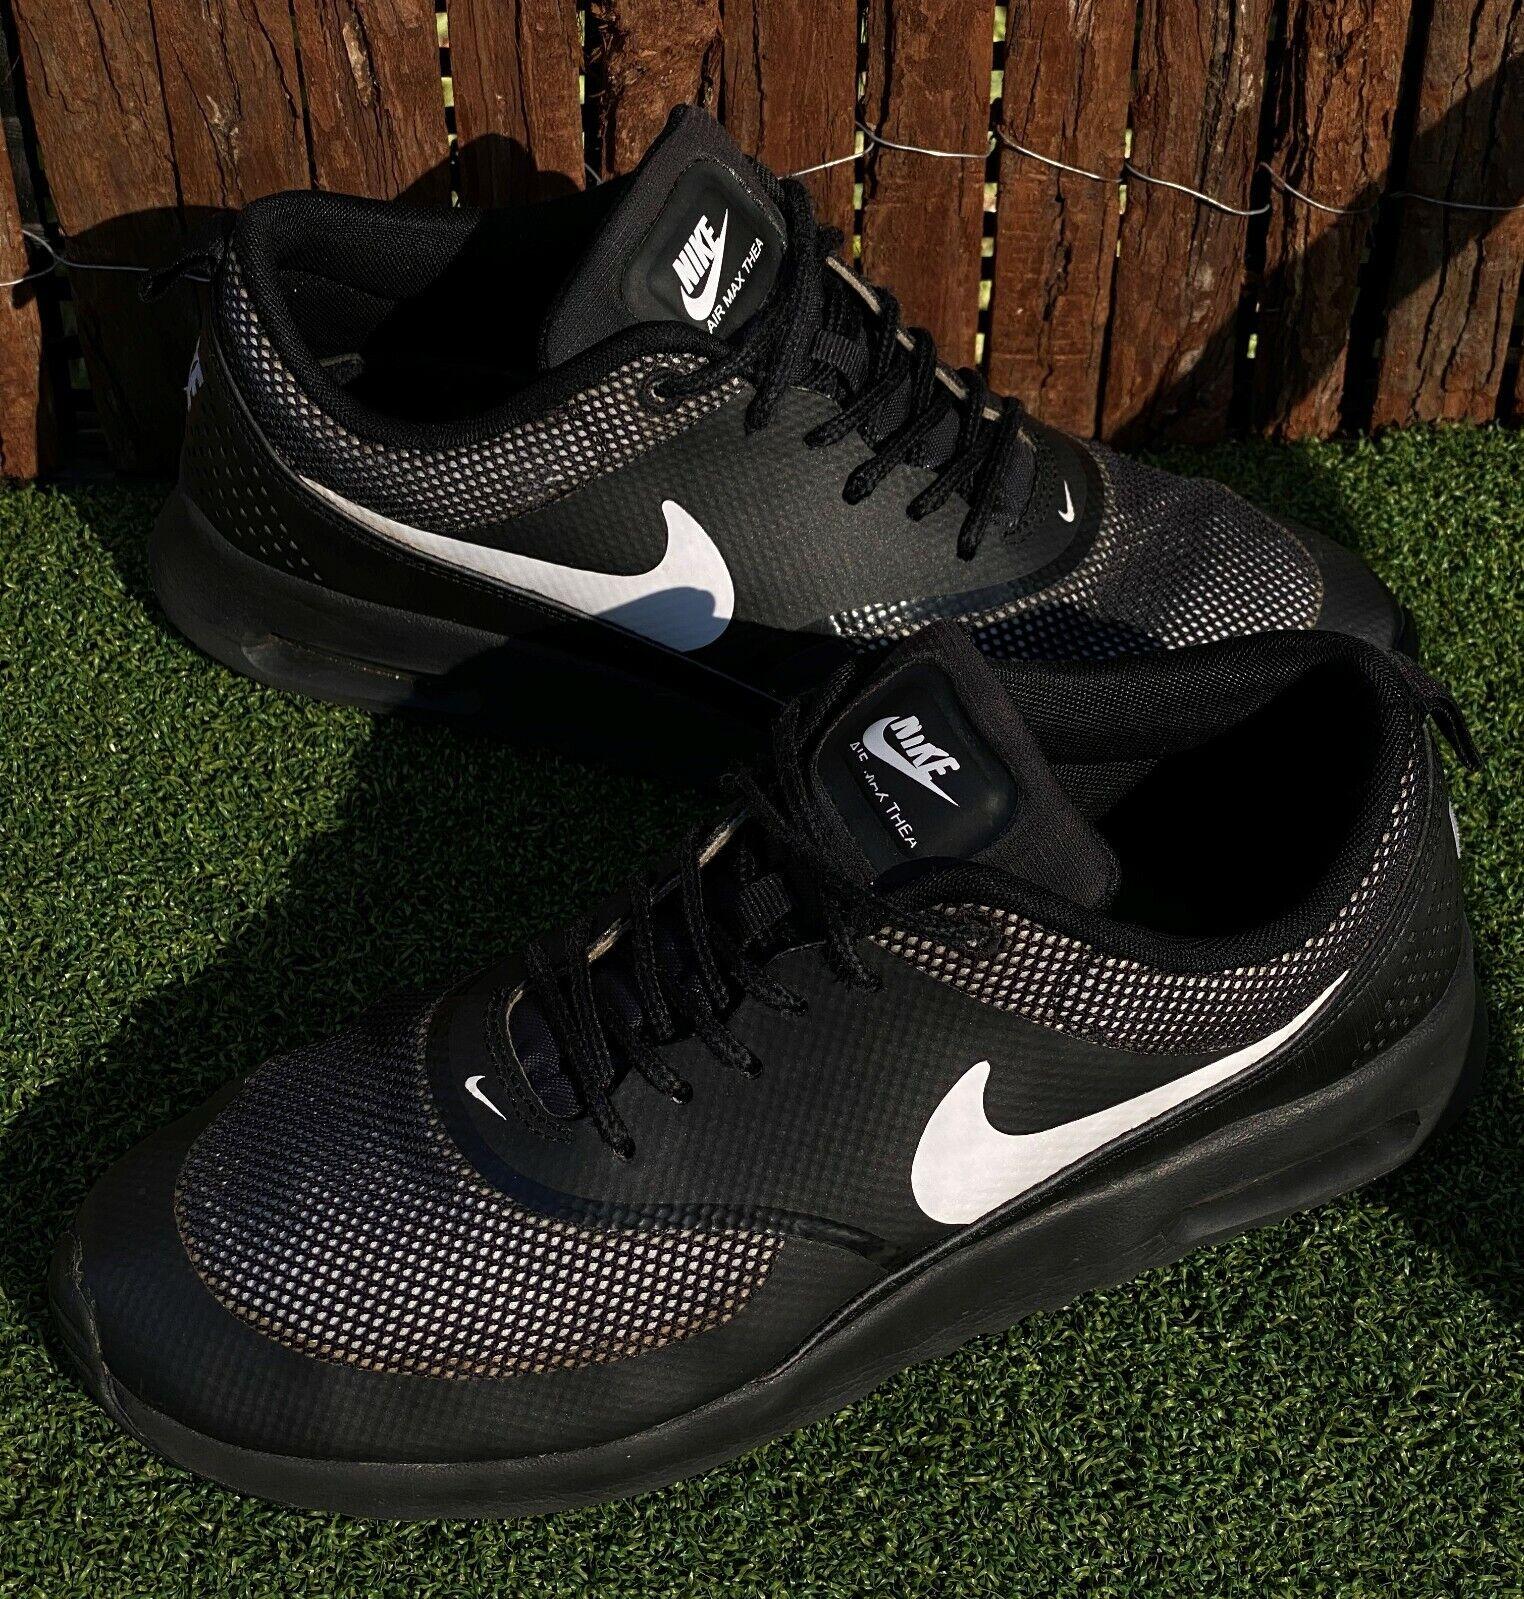 women's Nike Air Max Thea running black